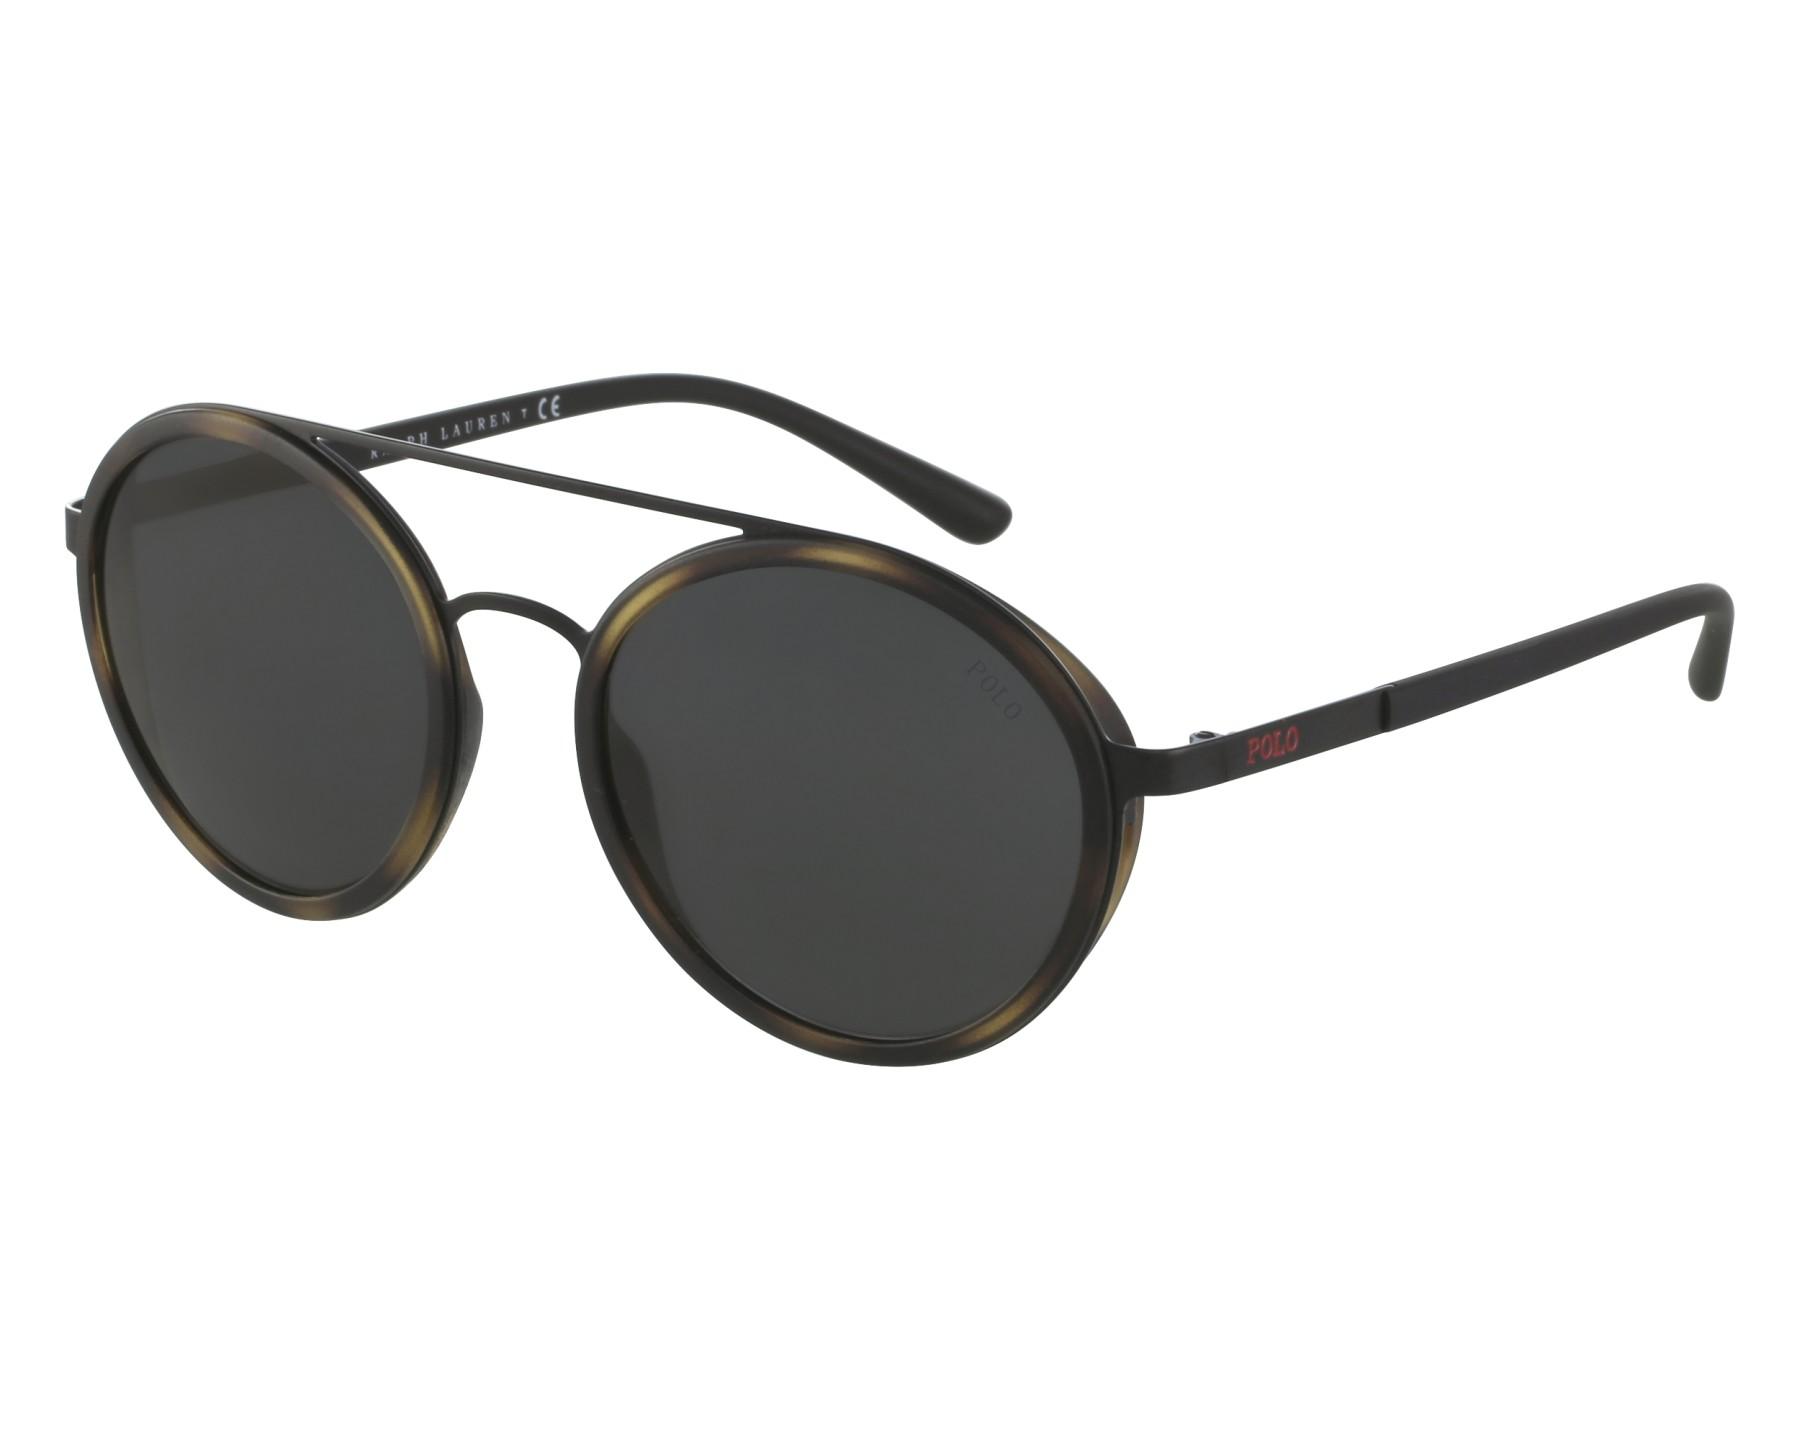 Spain Lauren Uk Polo 0691b Ralph Dimensions Sunglasses 19571 fyYb76vg